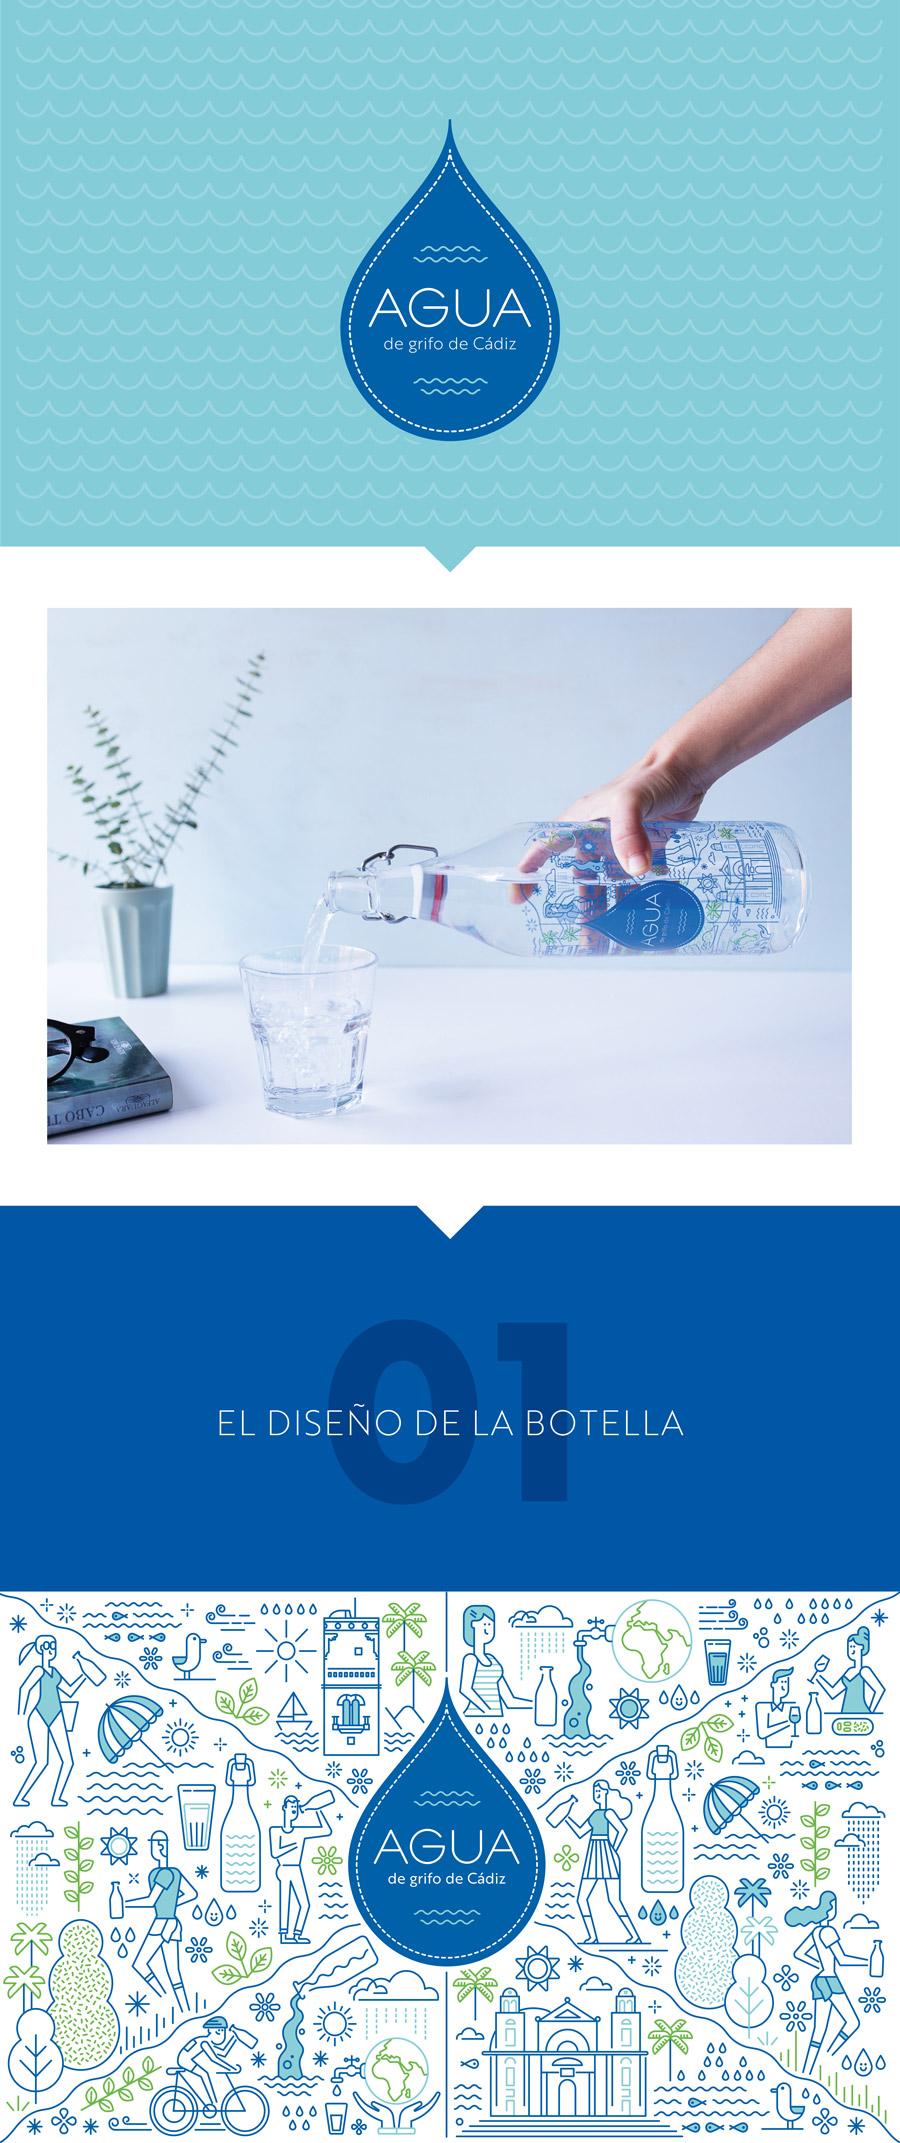 Botella Agua de grifo de Cádiz